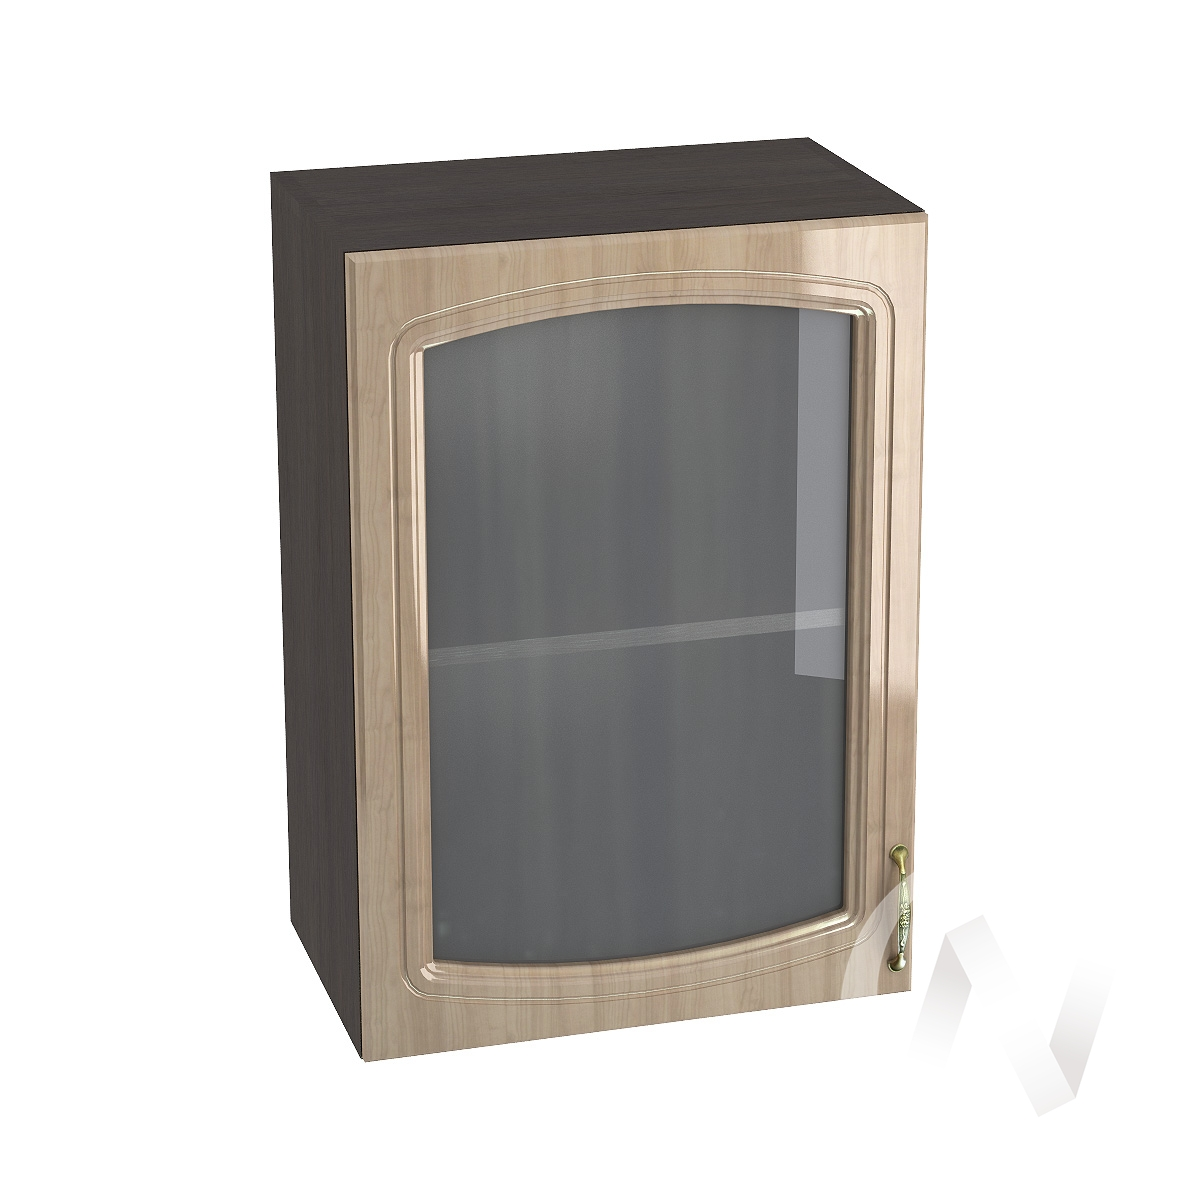 "Кухня ""Сити"": Шкаф верхний со стеклом 500, ШВС 500 (корпус венге)"